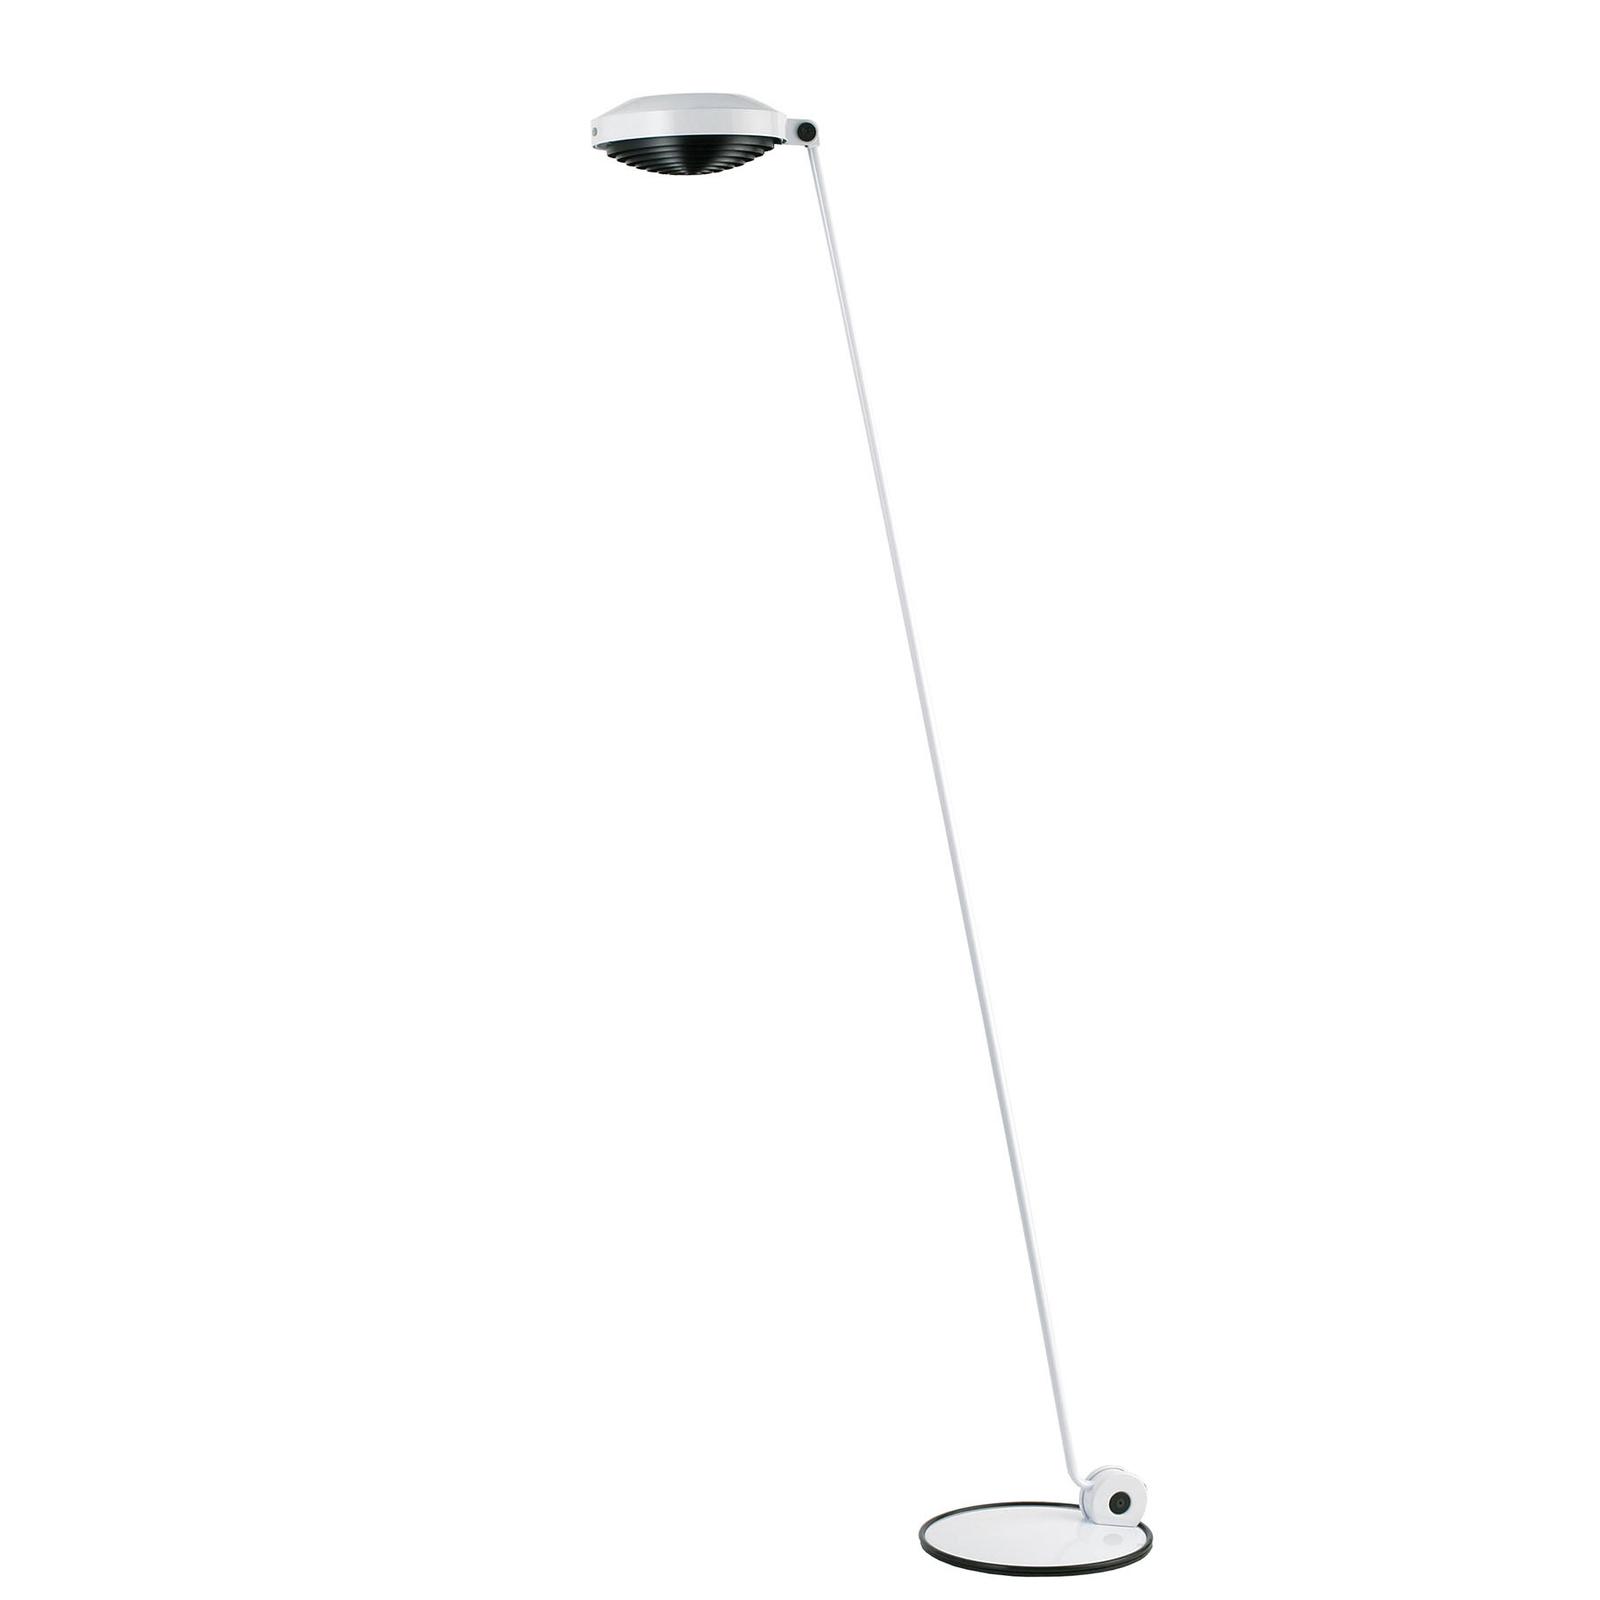 Lumina Elle 1 LED-Stehlampe H 180cm 3.000K weiß